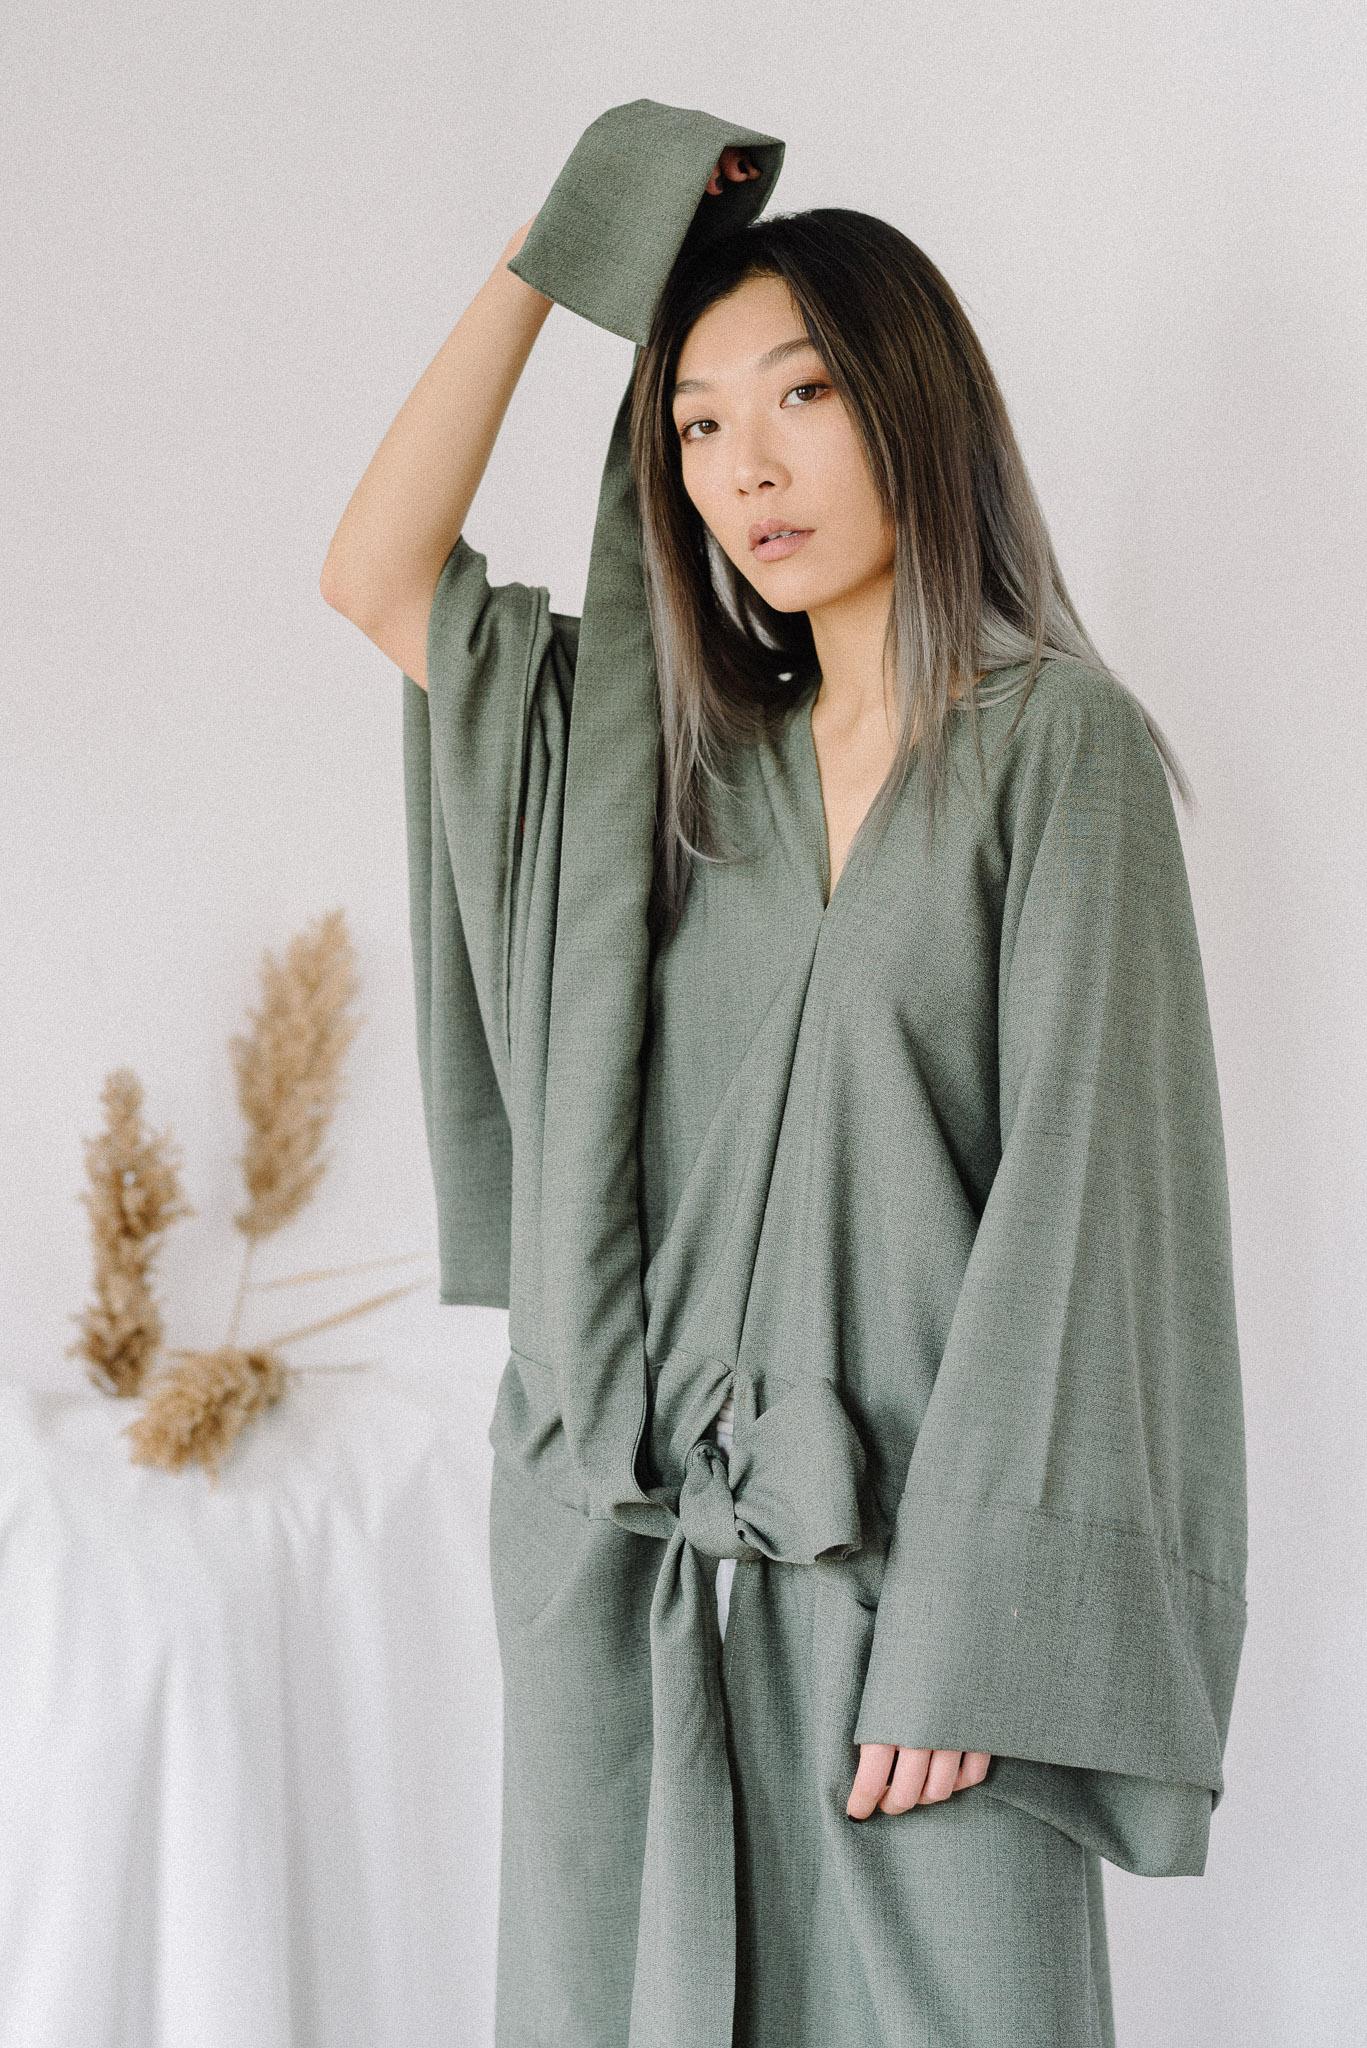 Threeones - 'Danchun' Dress